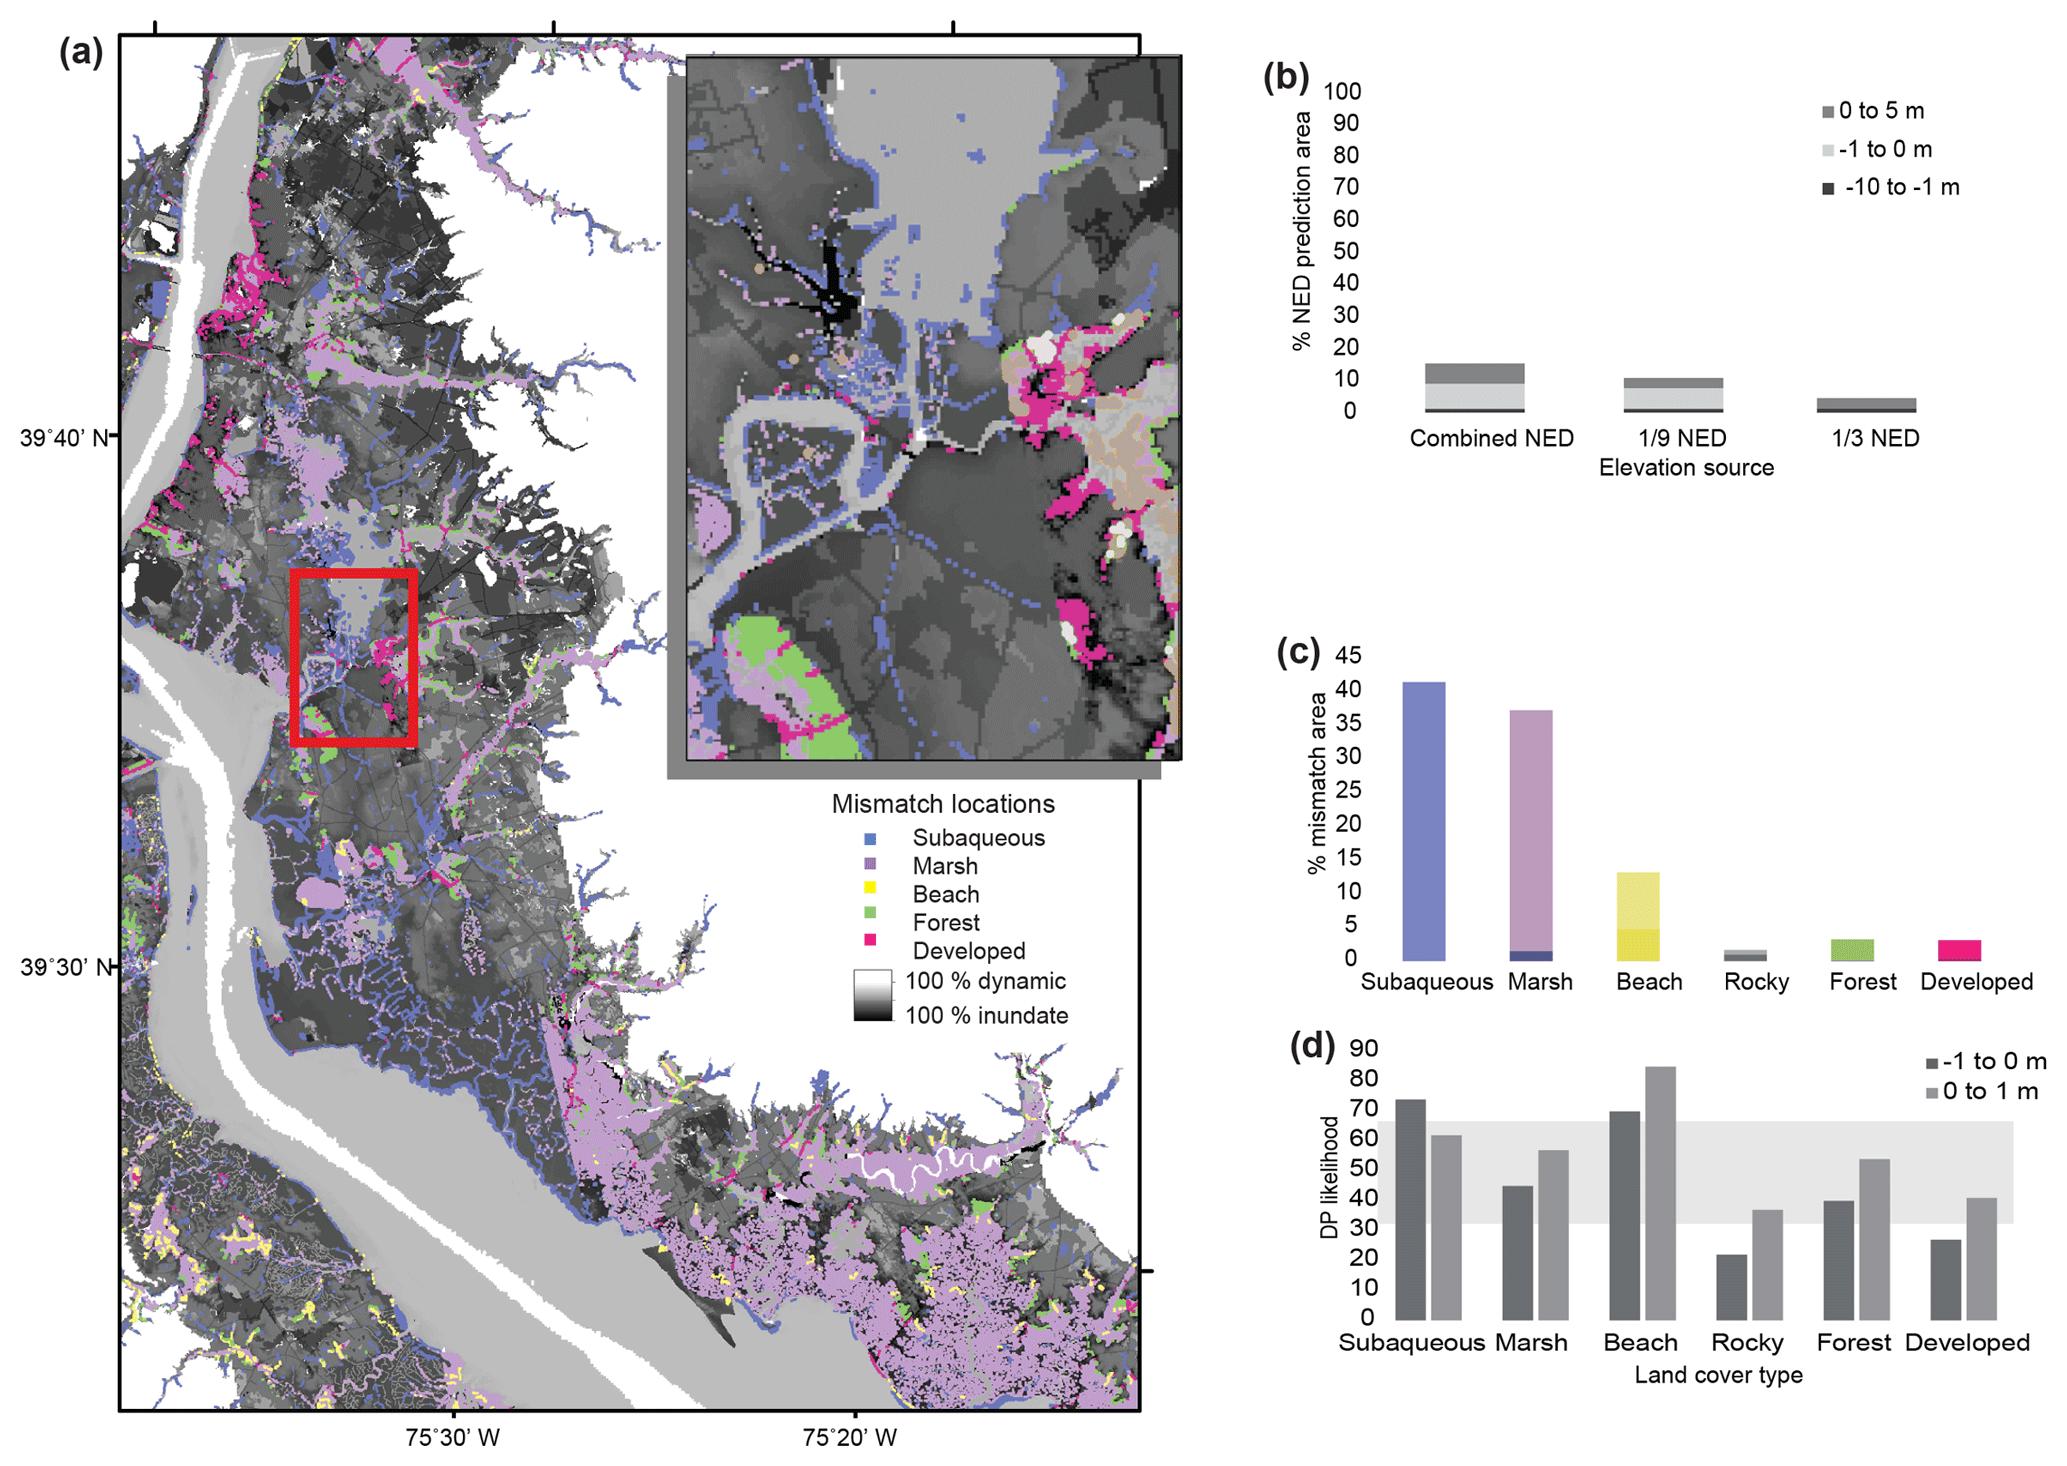 ESurf - Relationships between regional coastal land cover